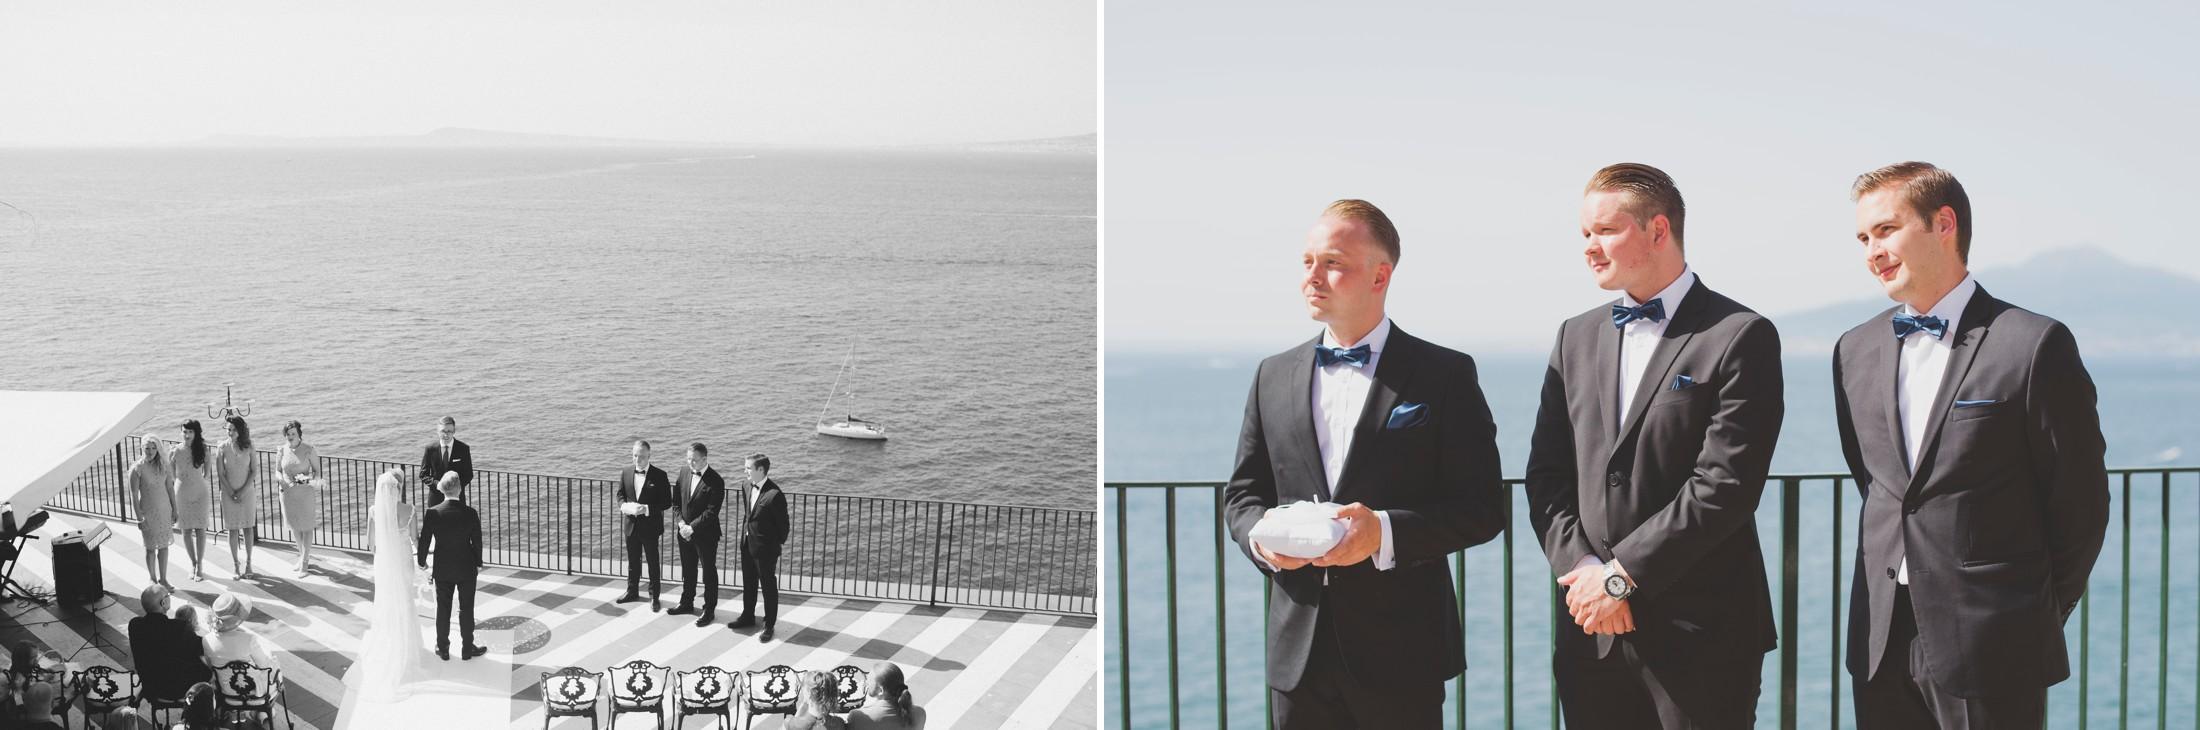 seaside wedding ceremony collage